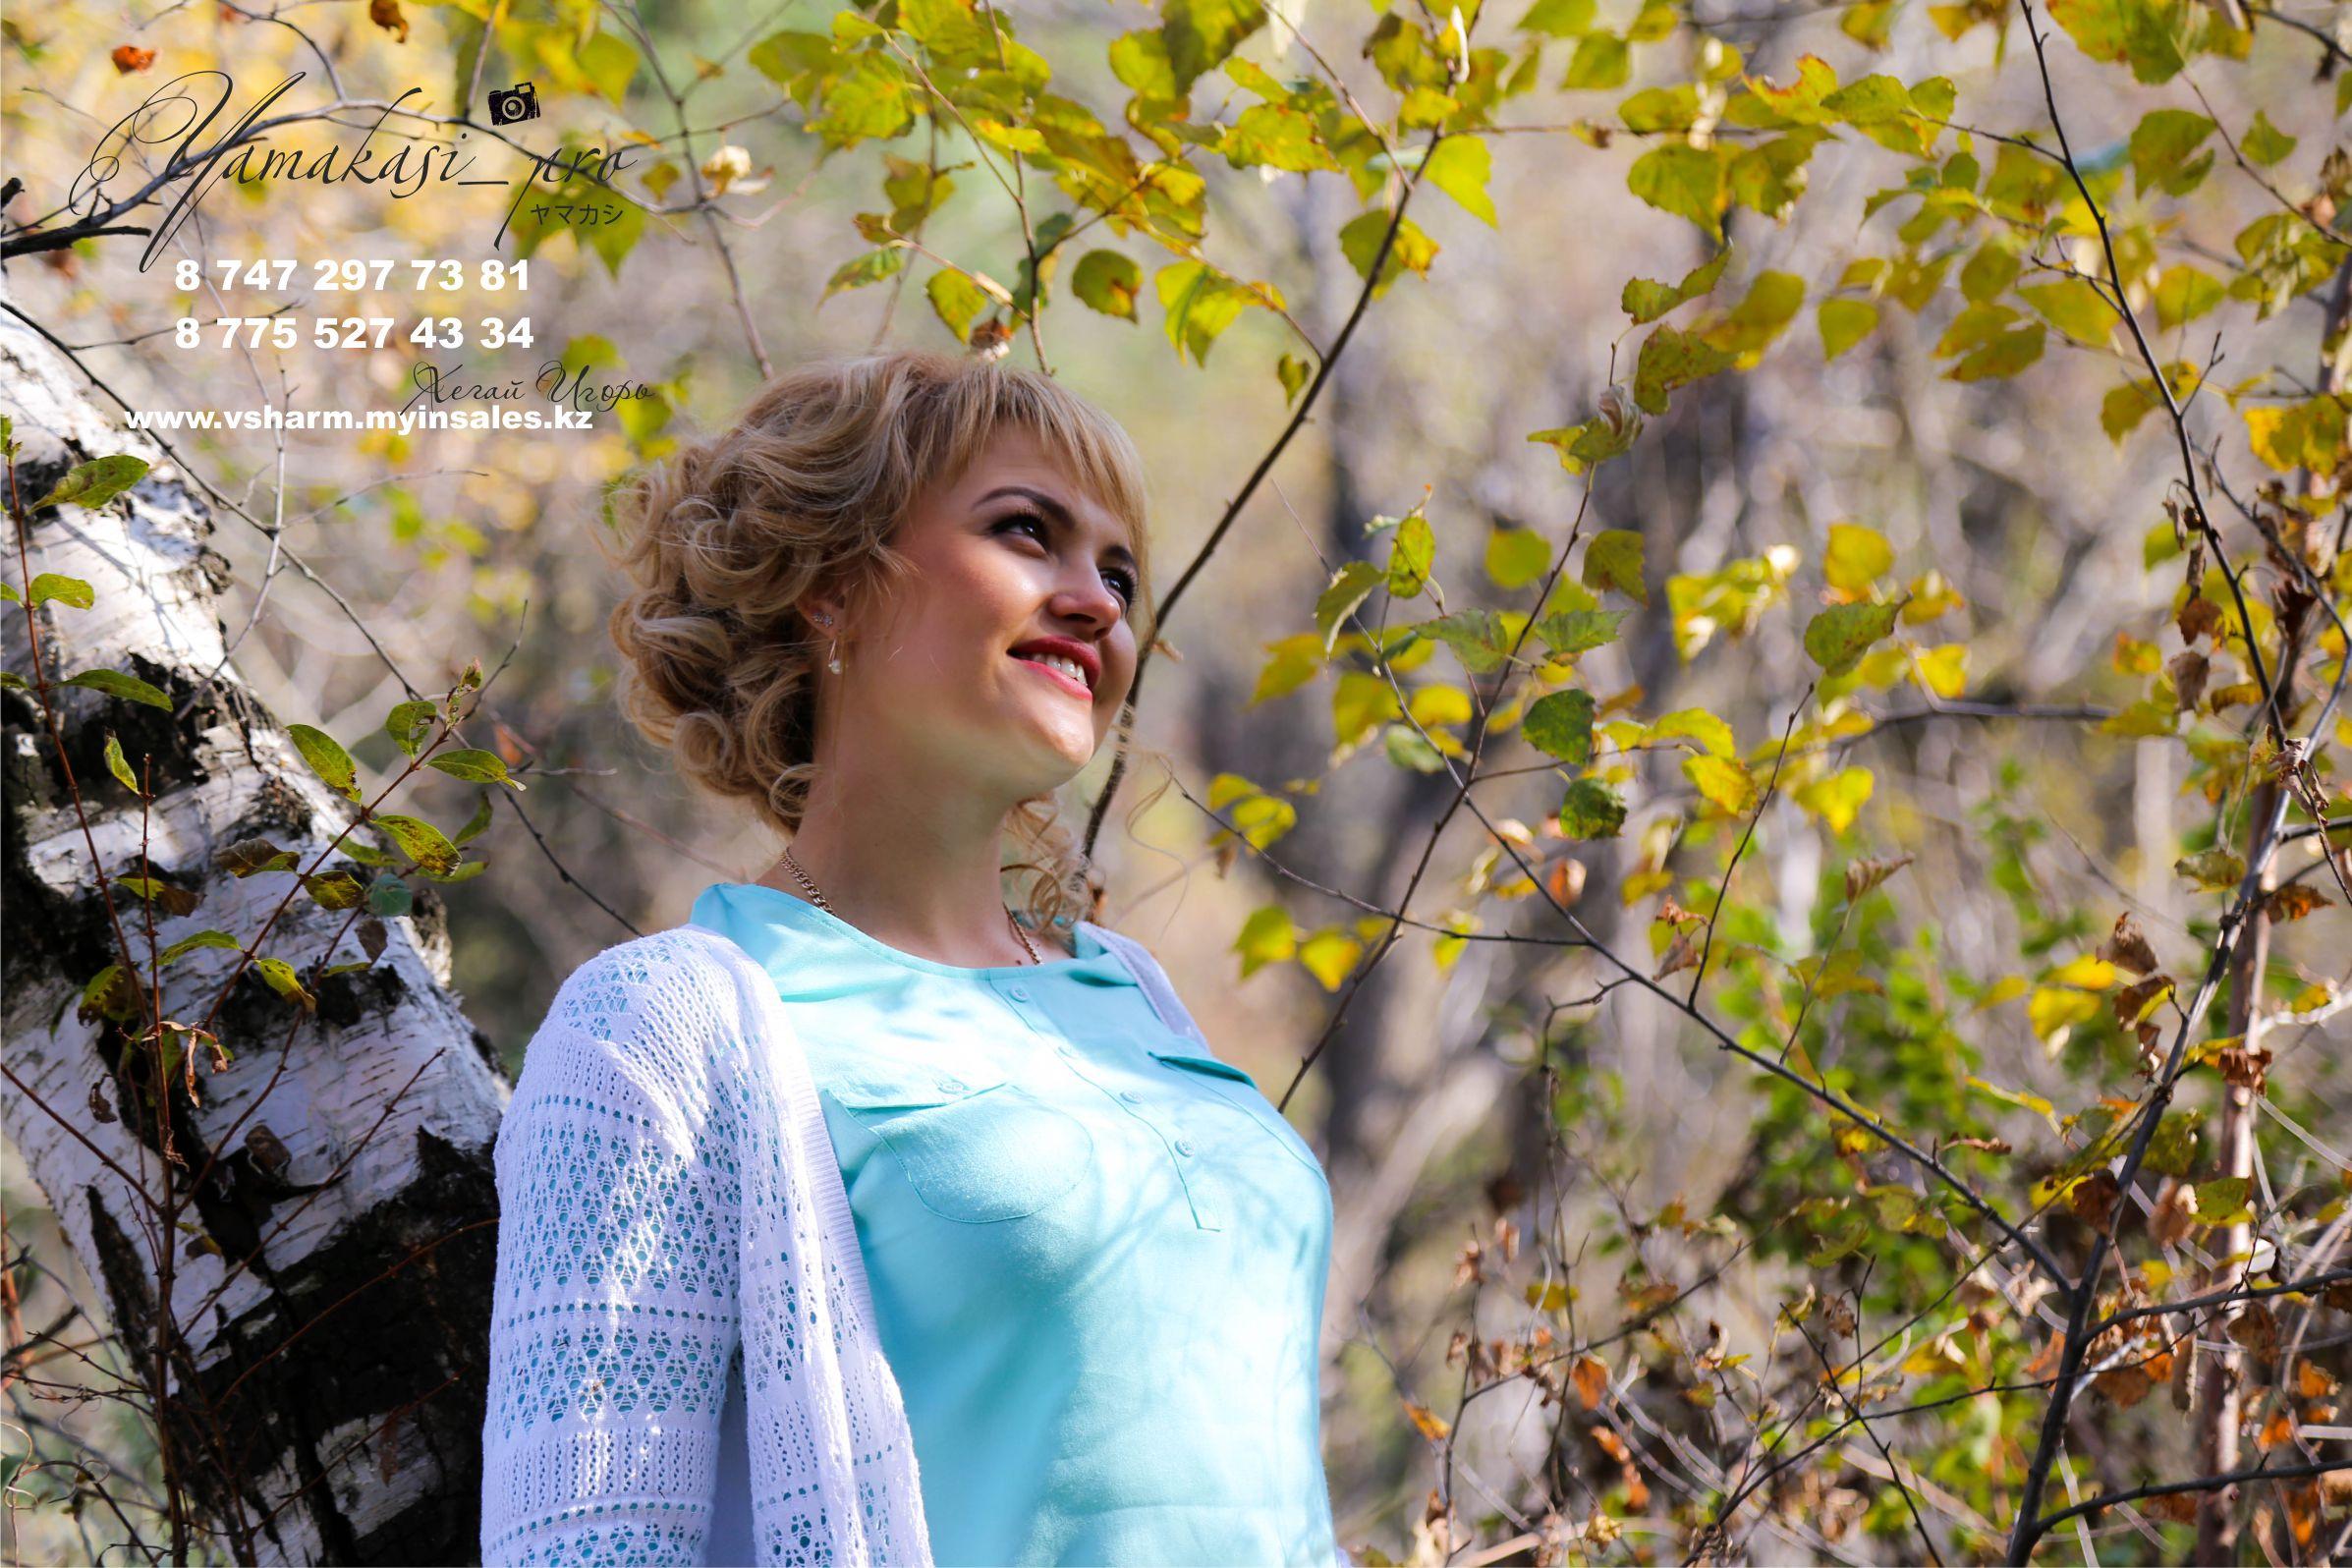 фотосъемка_кыз_узату_той_Алматы.jpg